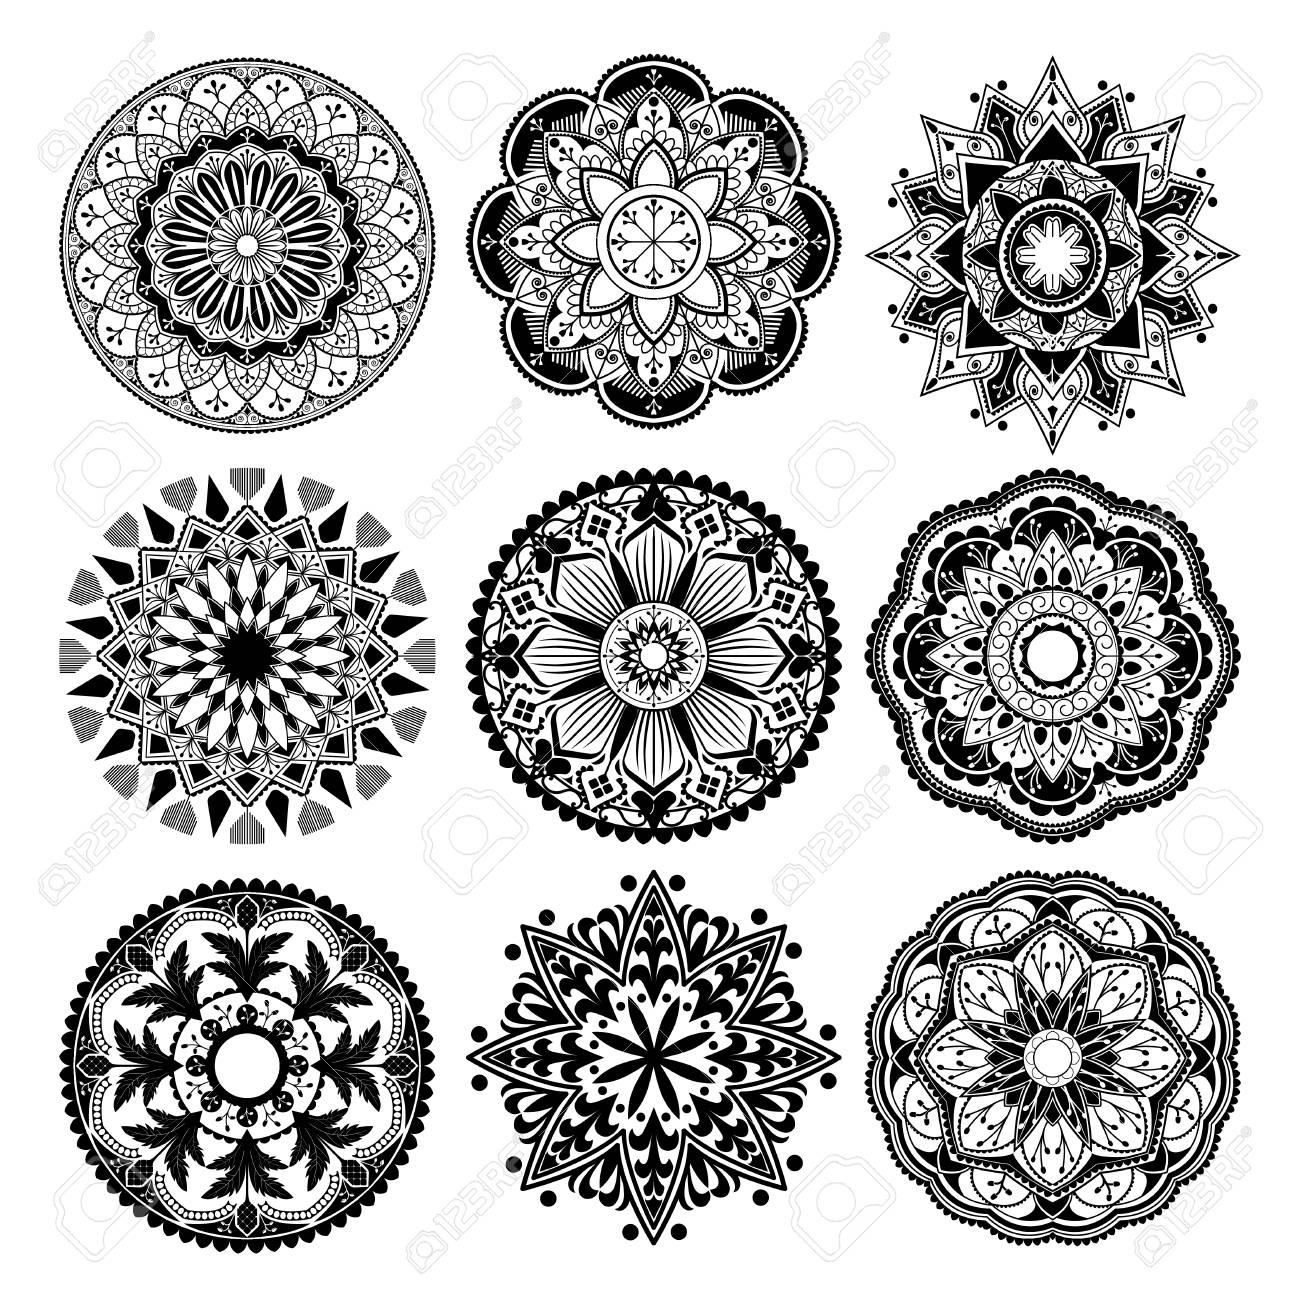 Black mandalas patterns set on white background - 118927622